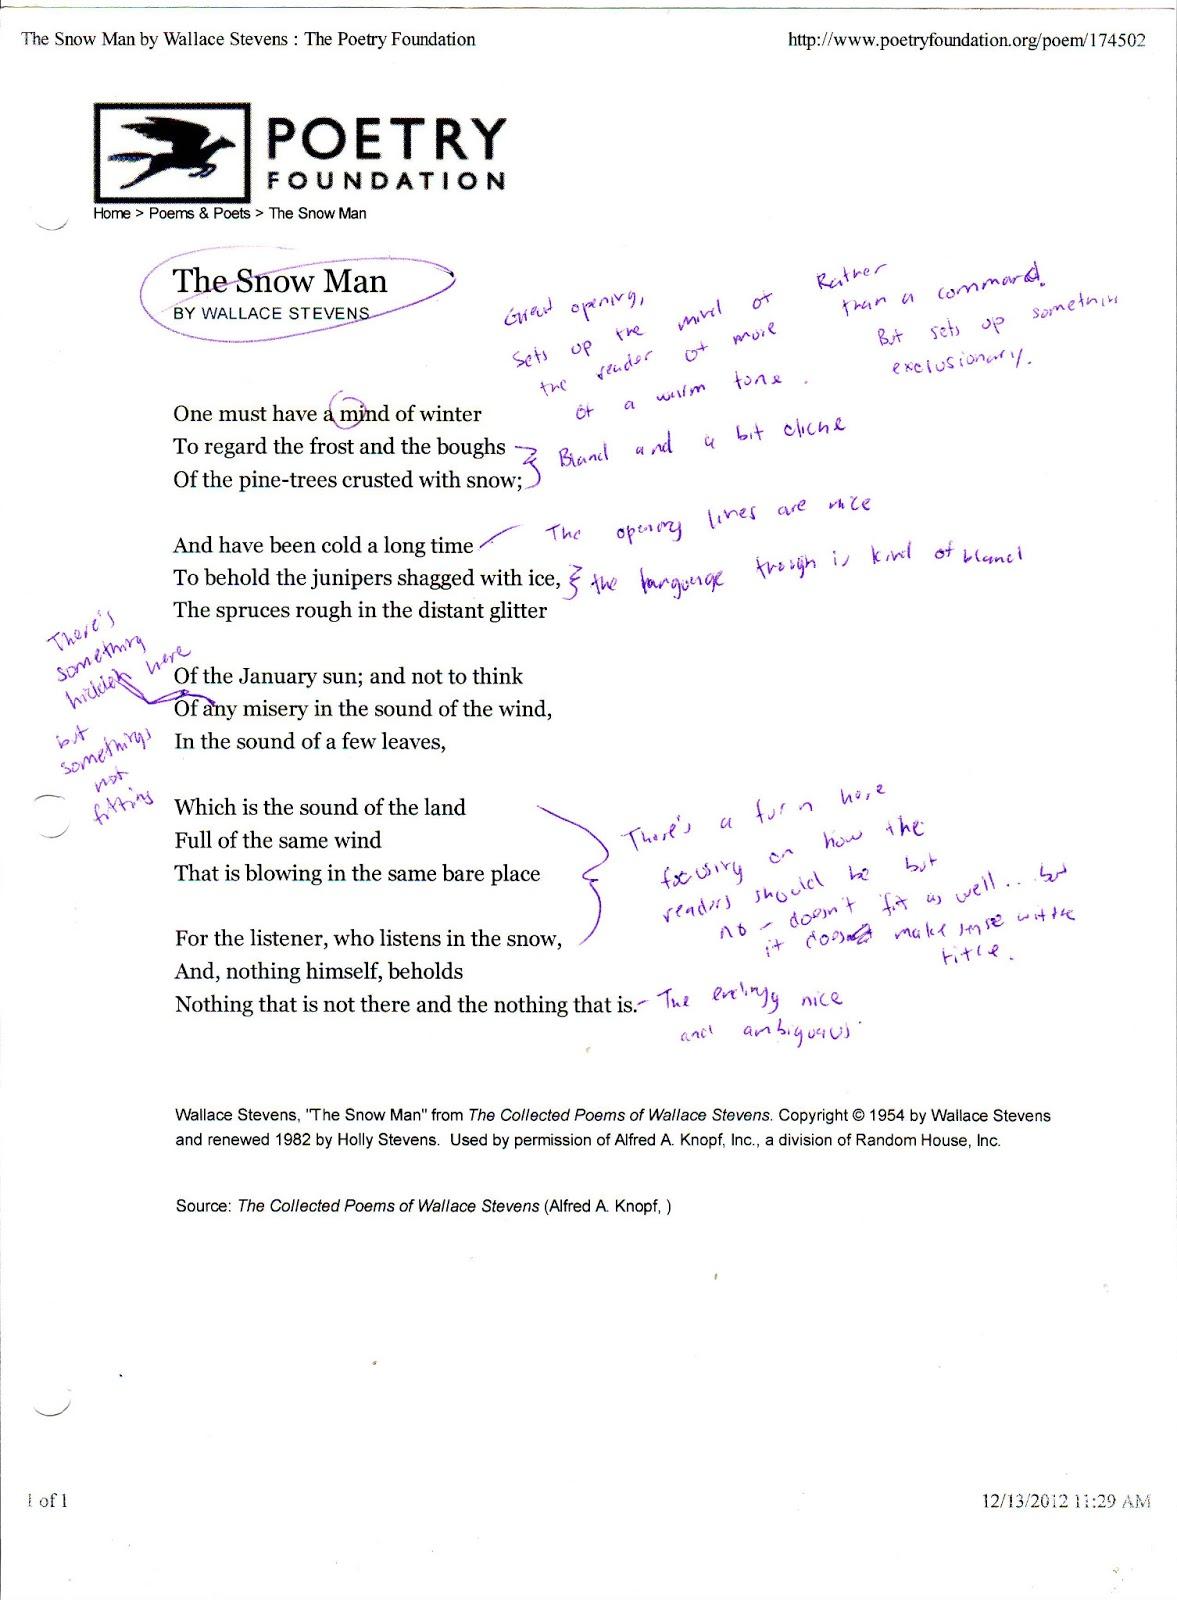 Critical essays on Wallace Stevens